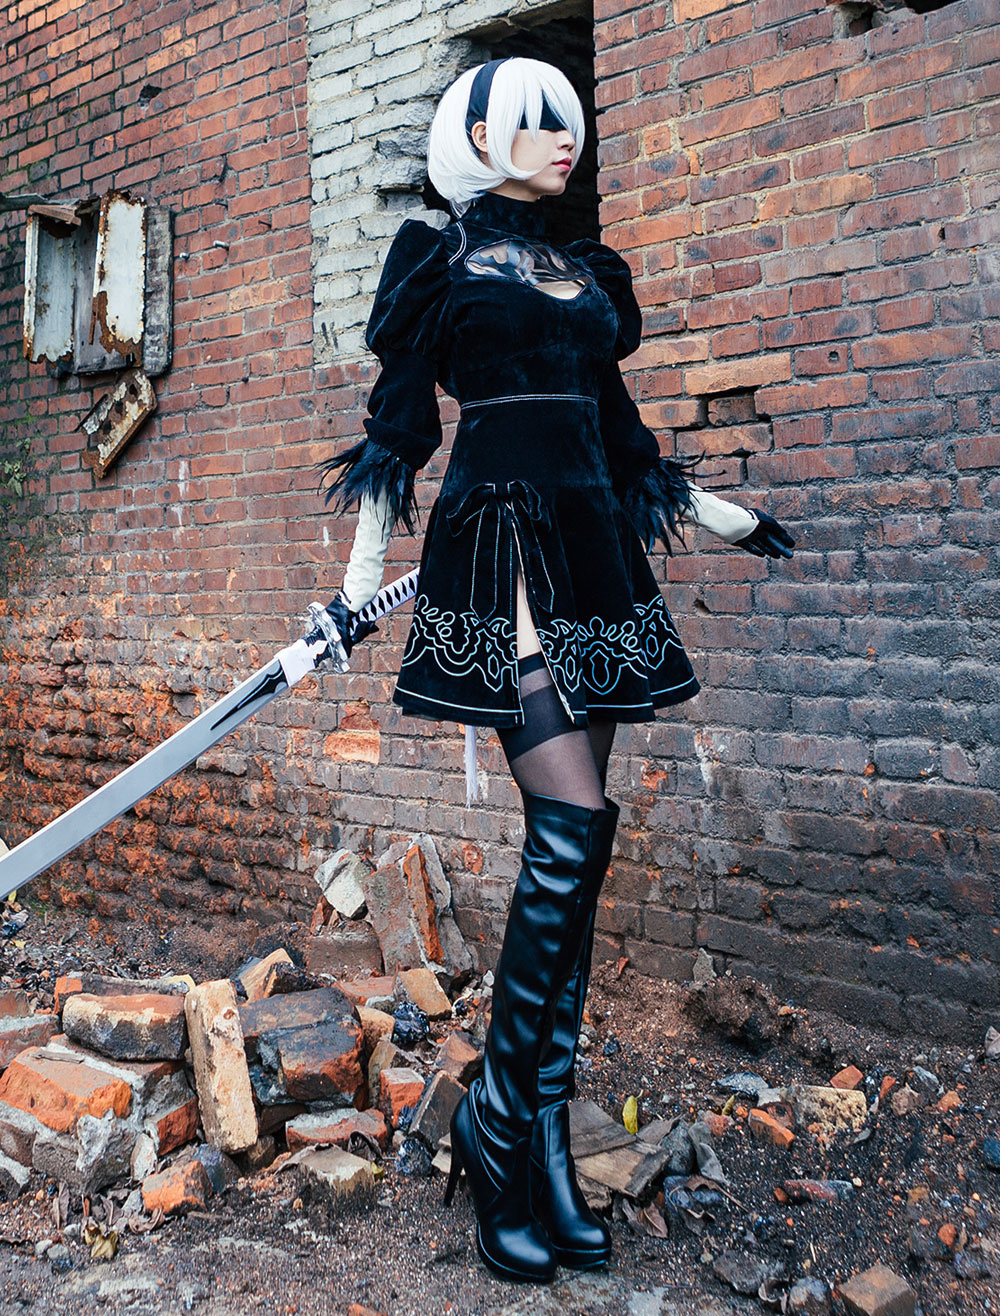 Unisex Clothing Shoes Accessories Nier Automata 2b Yorha No 2 Type B Black Yorha Cosplay Costume Halloween Set Myself Co Ls